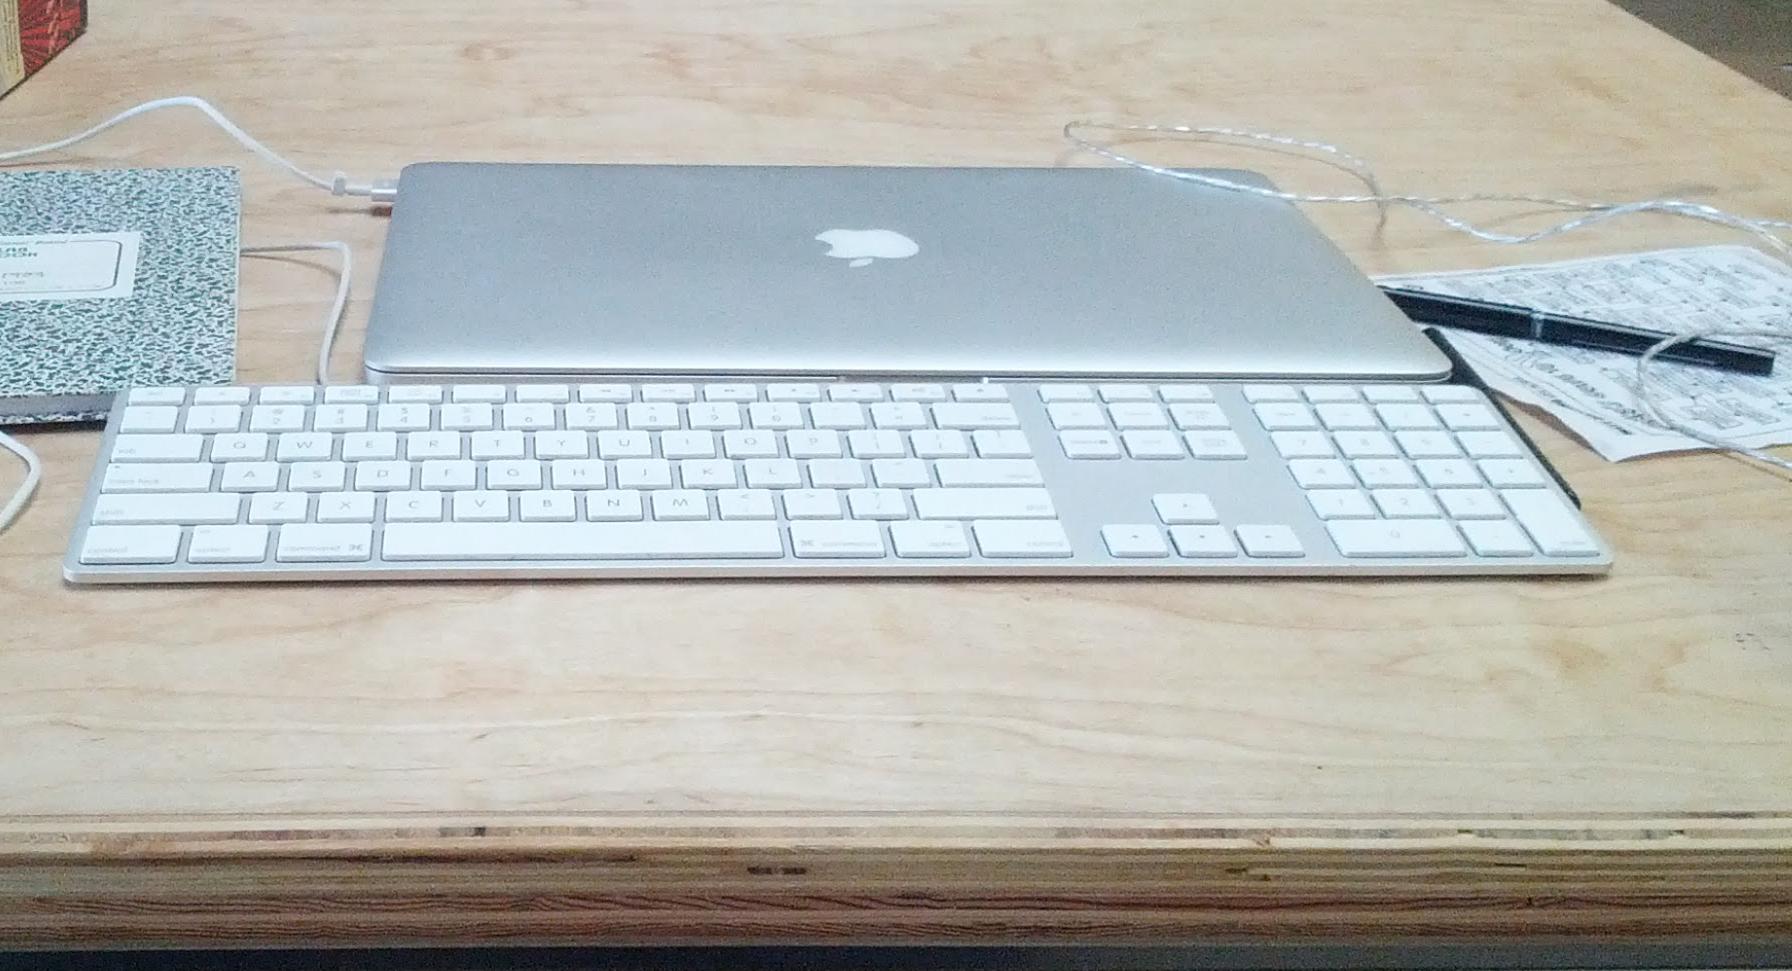 bhs laptop 2013